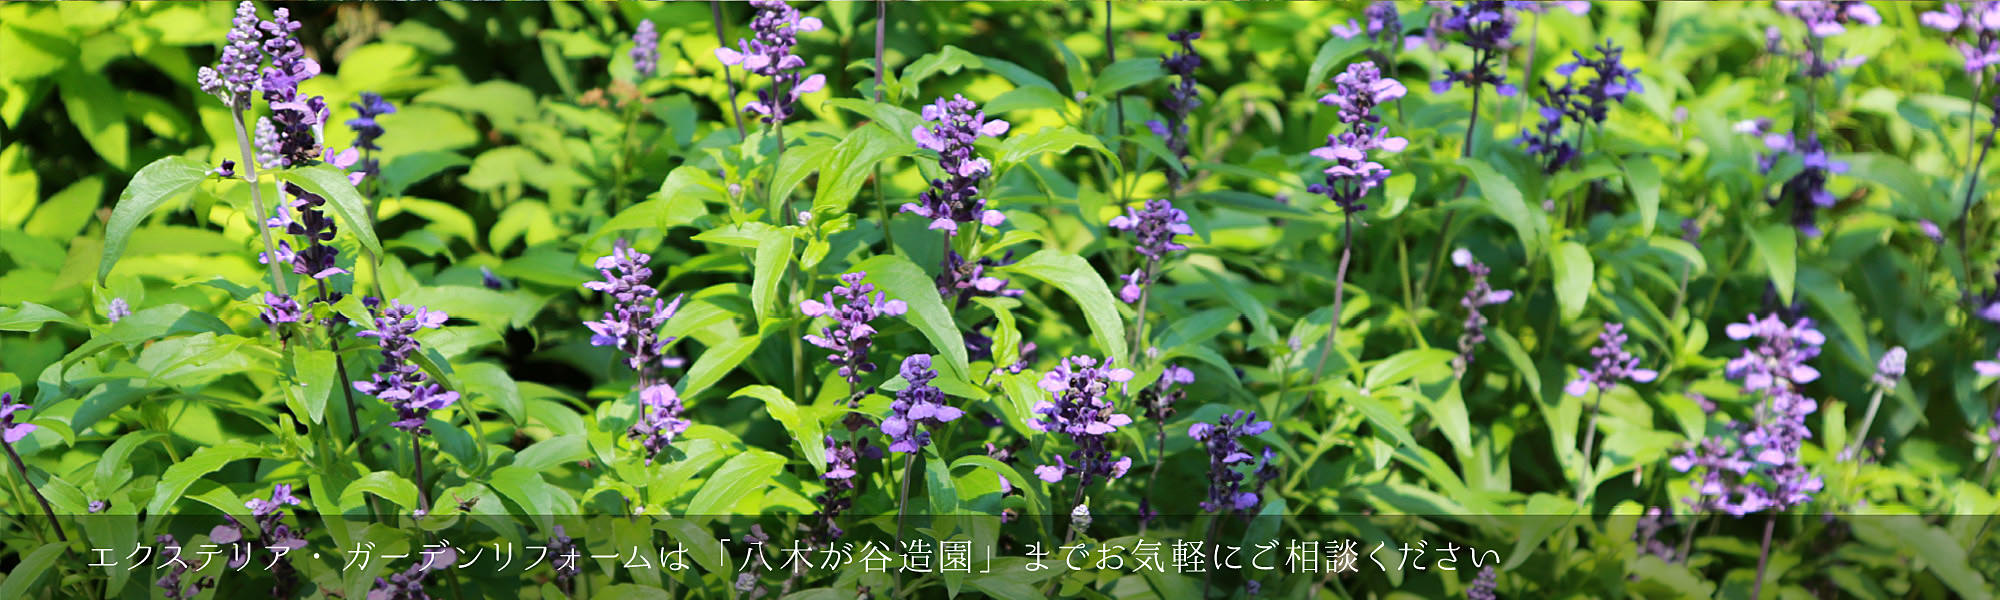 <a href='http://yakigaya-zouen.com/archives/660'></a>